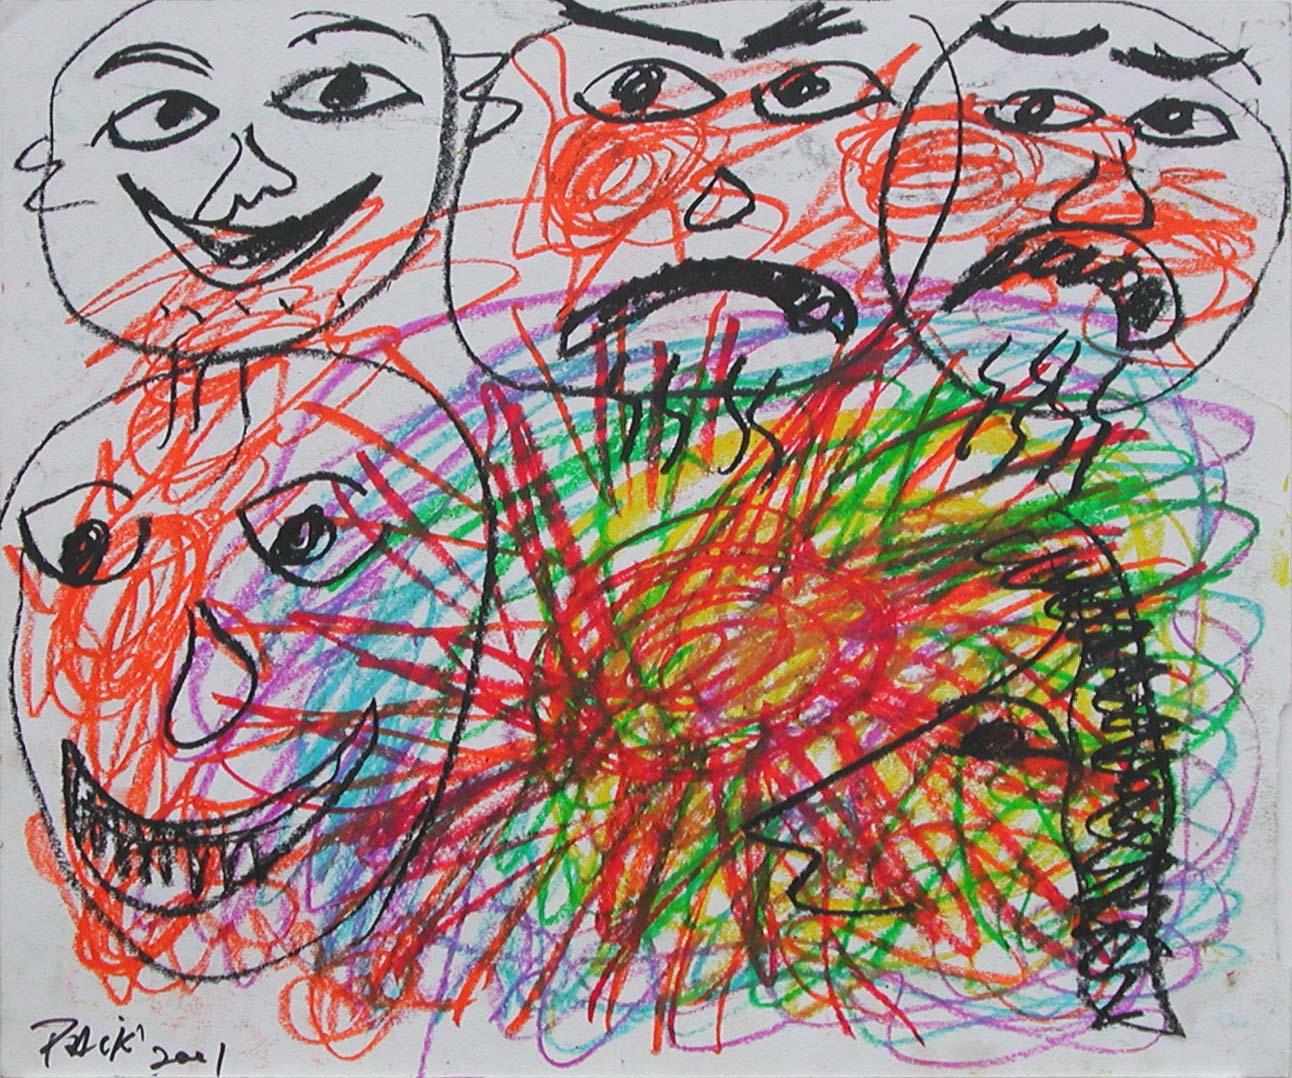 NamJune Paik_喜怒哀樂_Crayon on Paper_35x43cm_2001